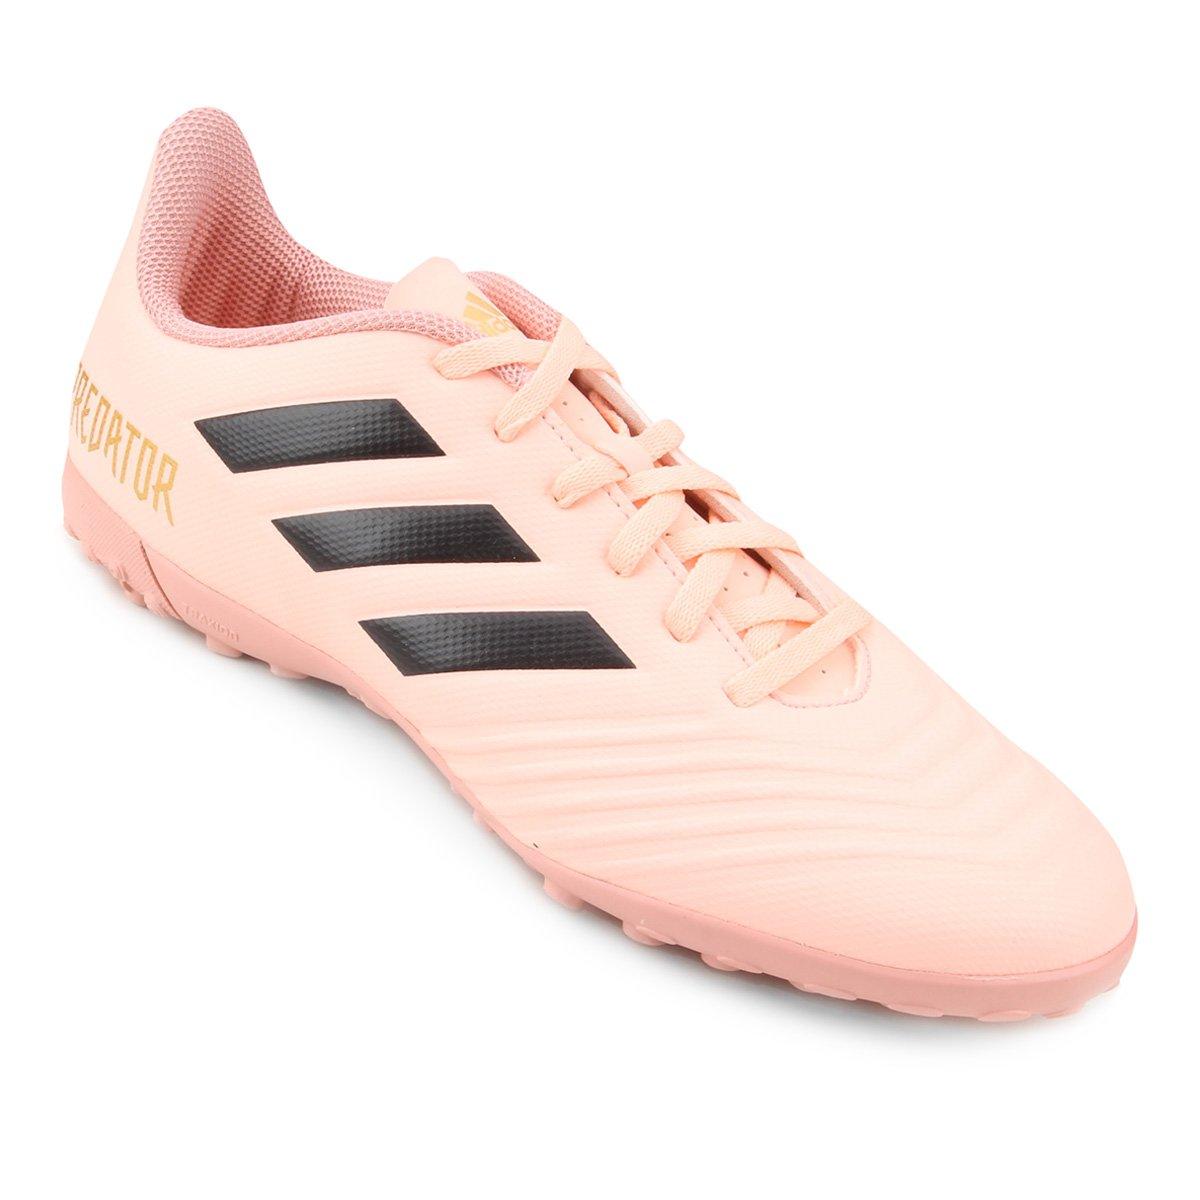 Chuteira Society Adidas Predator Tan 18 4 TF - Rosa e Preto - Compre ... c55110b41c4dd